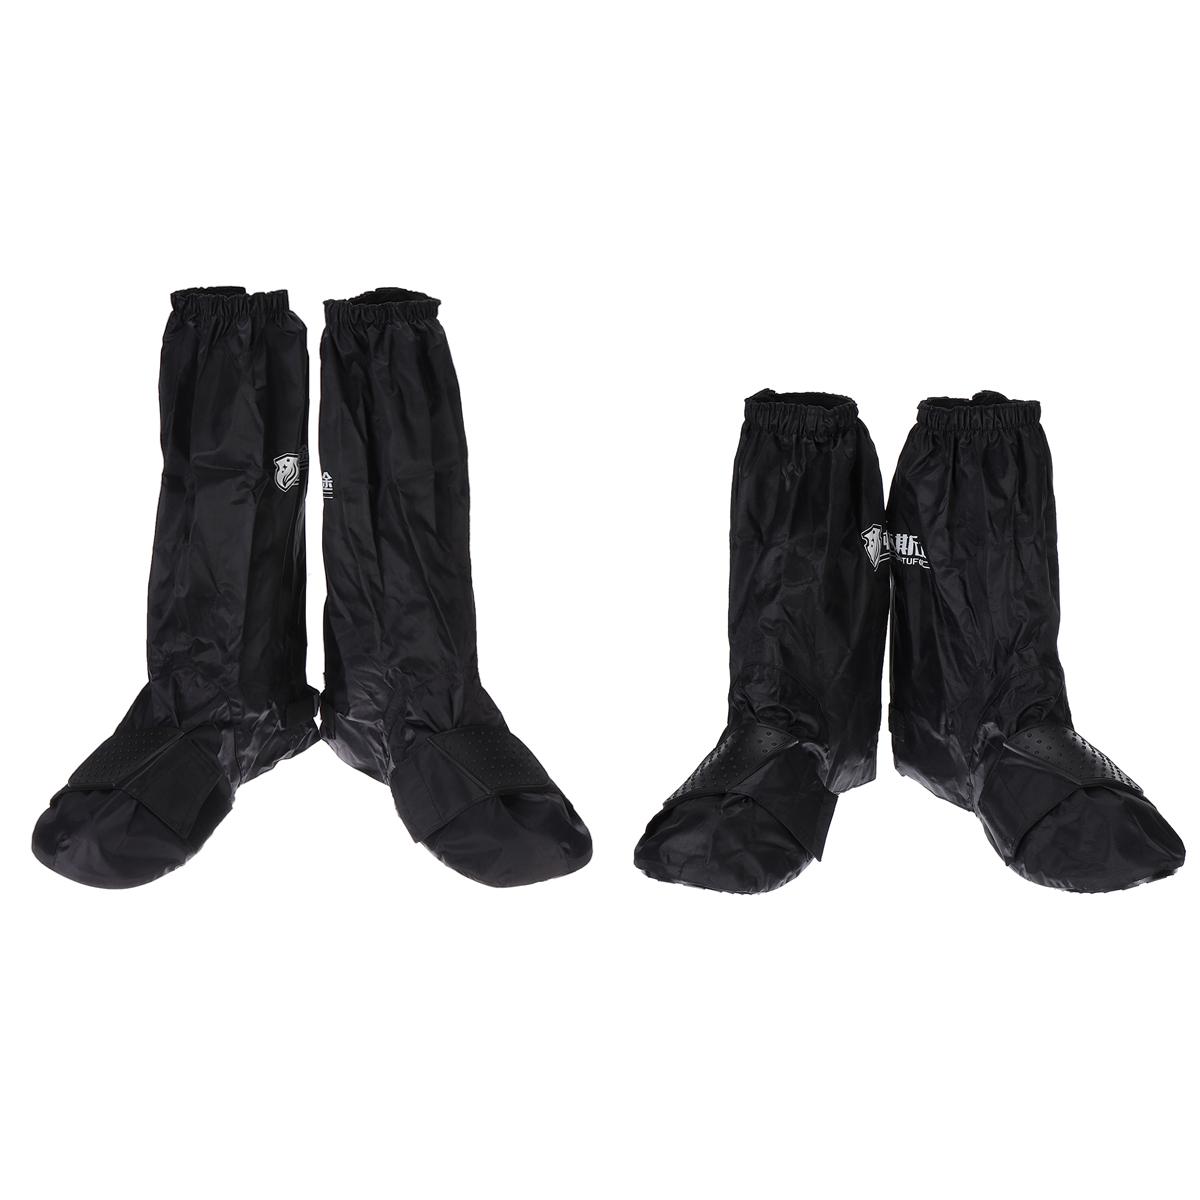 2Pair Reusable Rain Snow Shoe Cover Waterproof Overshoes Boot Anti-Slip Foldable